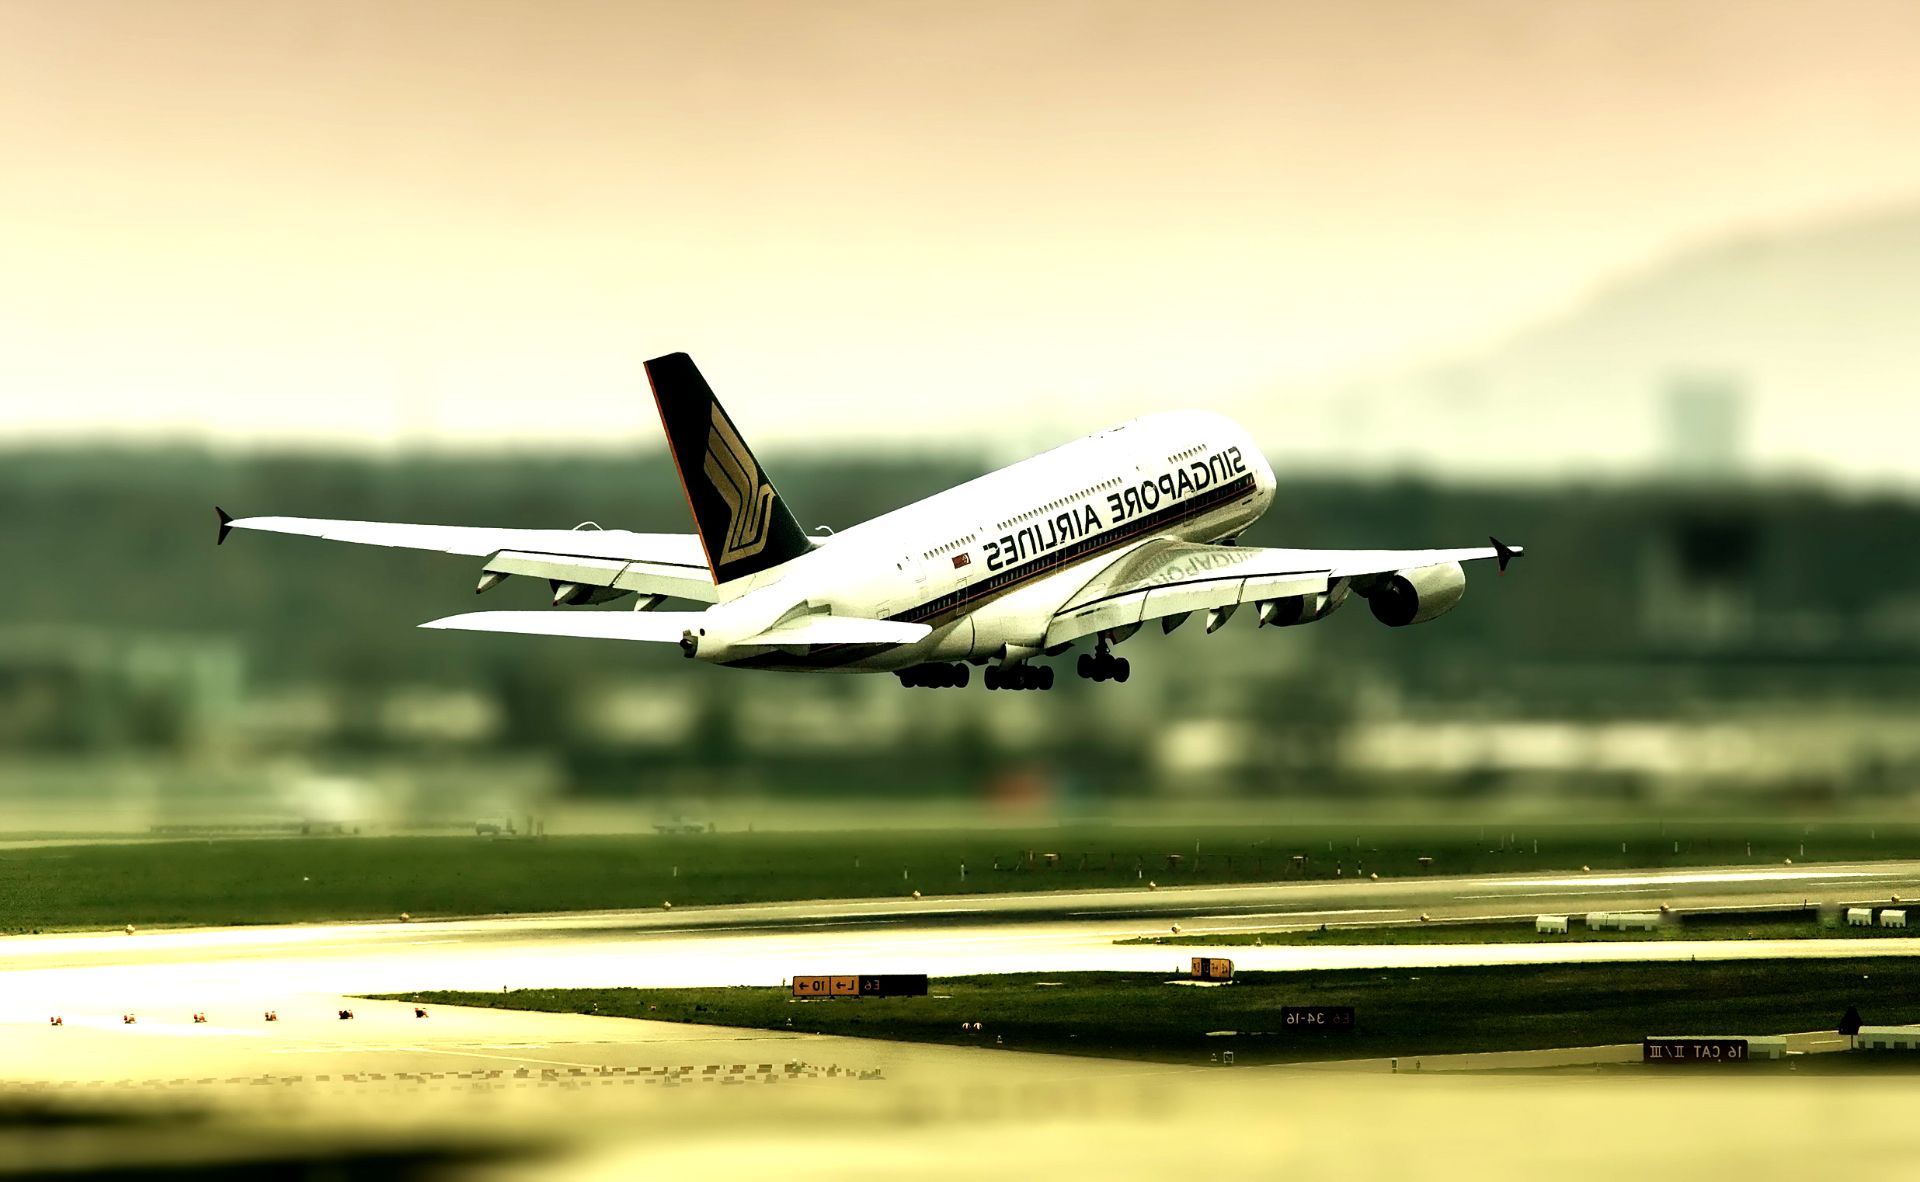 Laptop Aeroplane Flying Hd Wallpaper Hd Wallpapers 4 Us